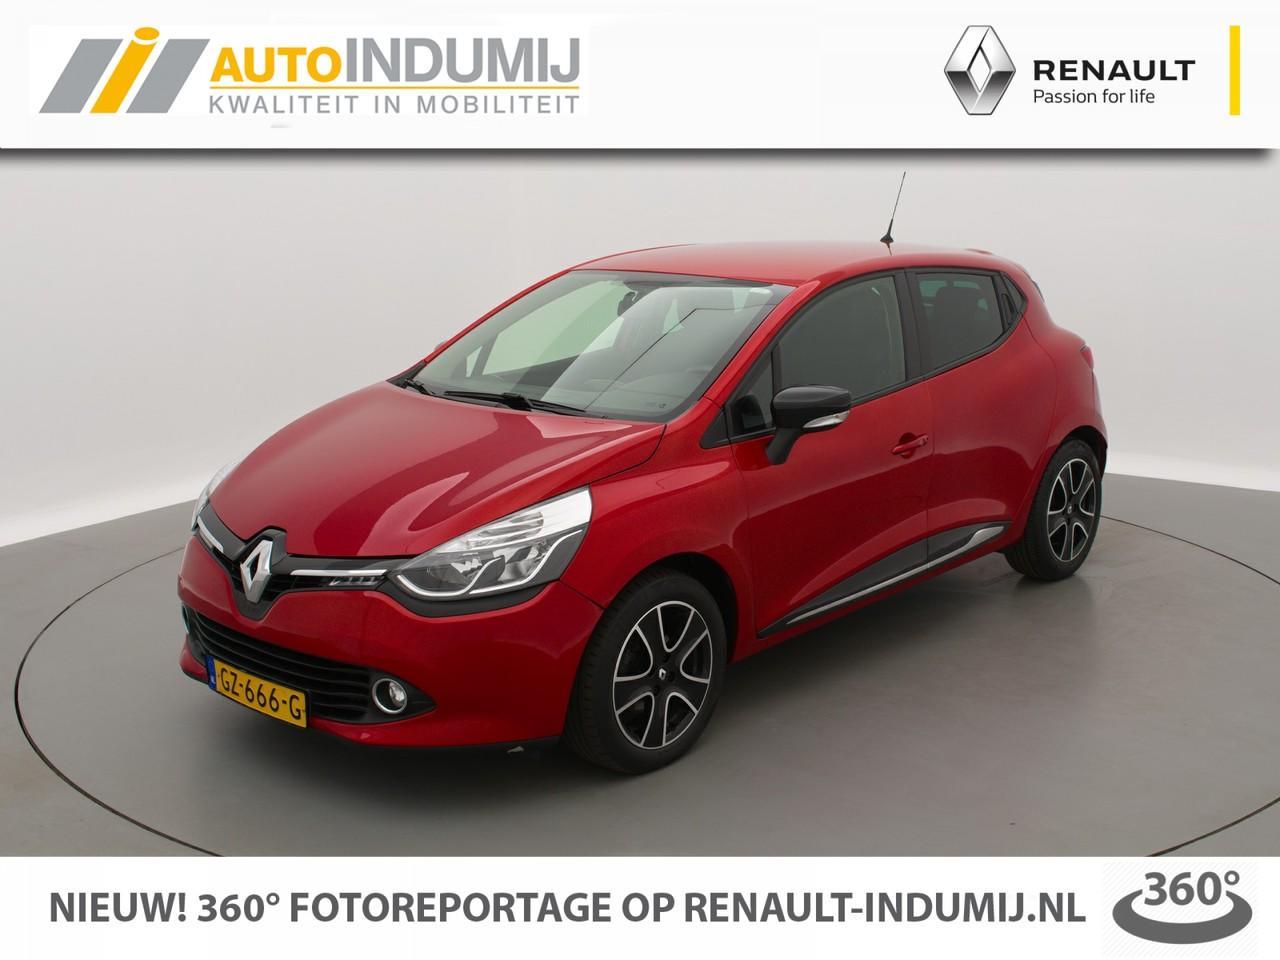 Renault Clio Tce 90 expression // navi // airco // lm velgen